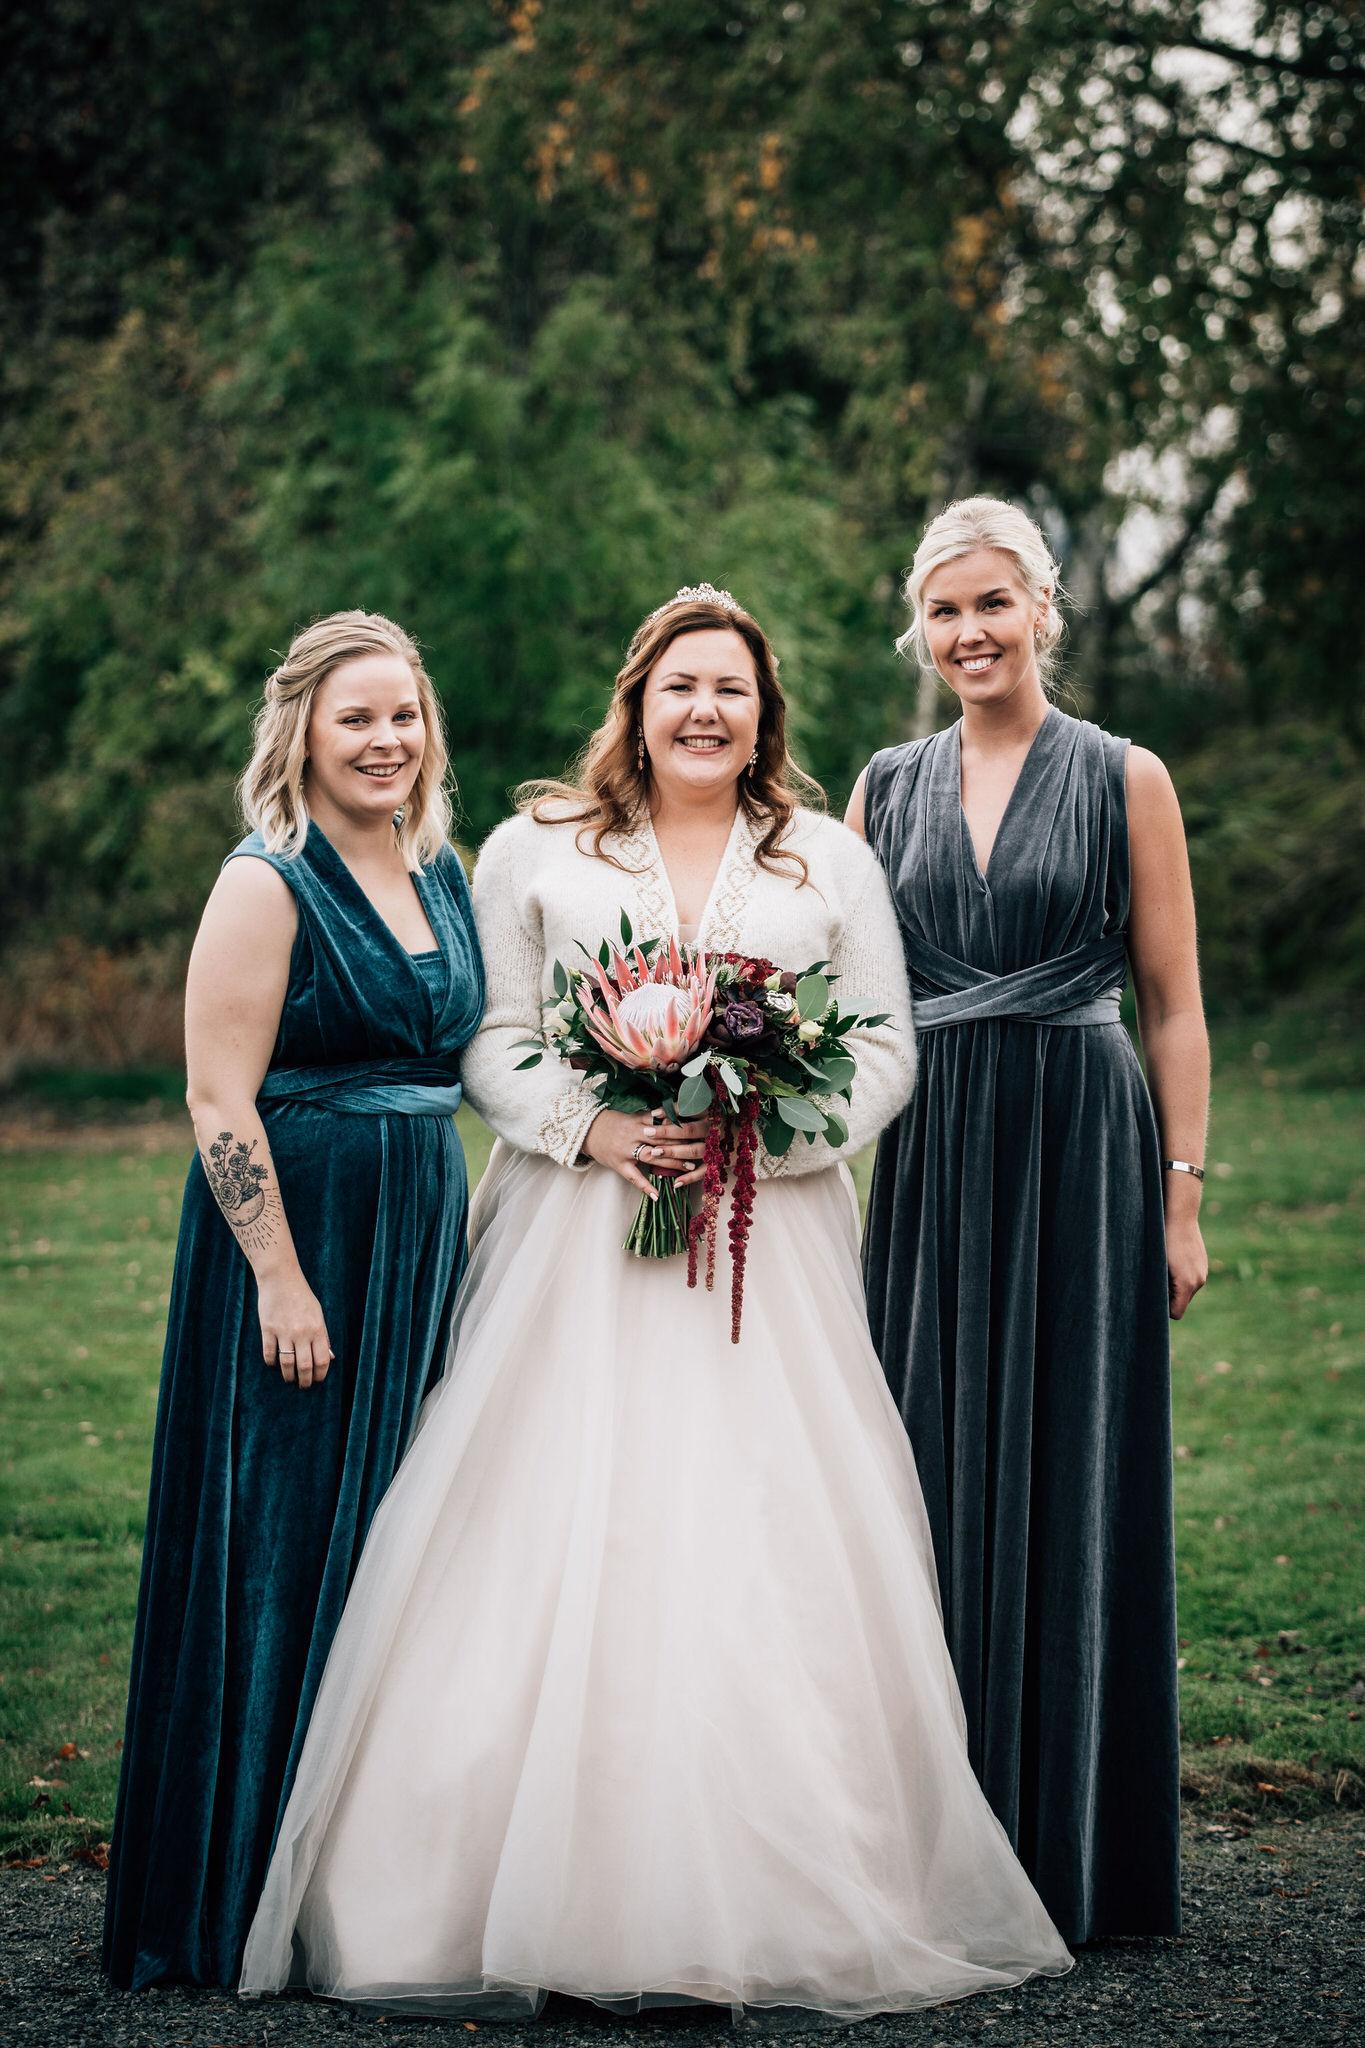 _N857970_fotografering_larvik_bryllup_aspargesgarden_.jpg